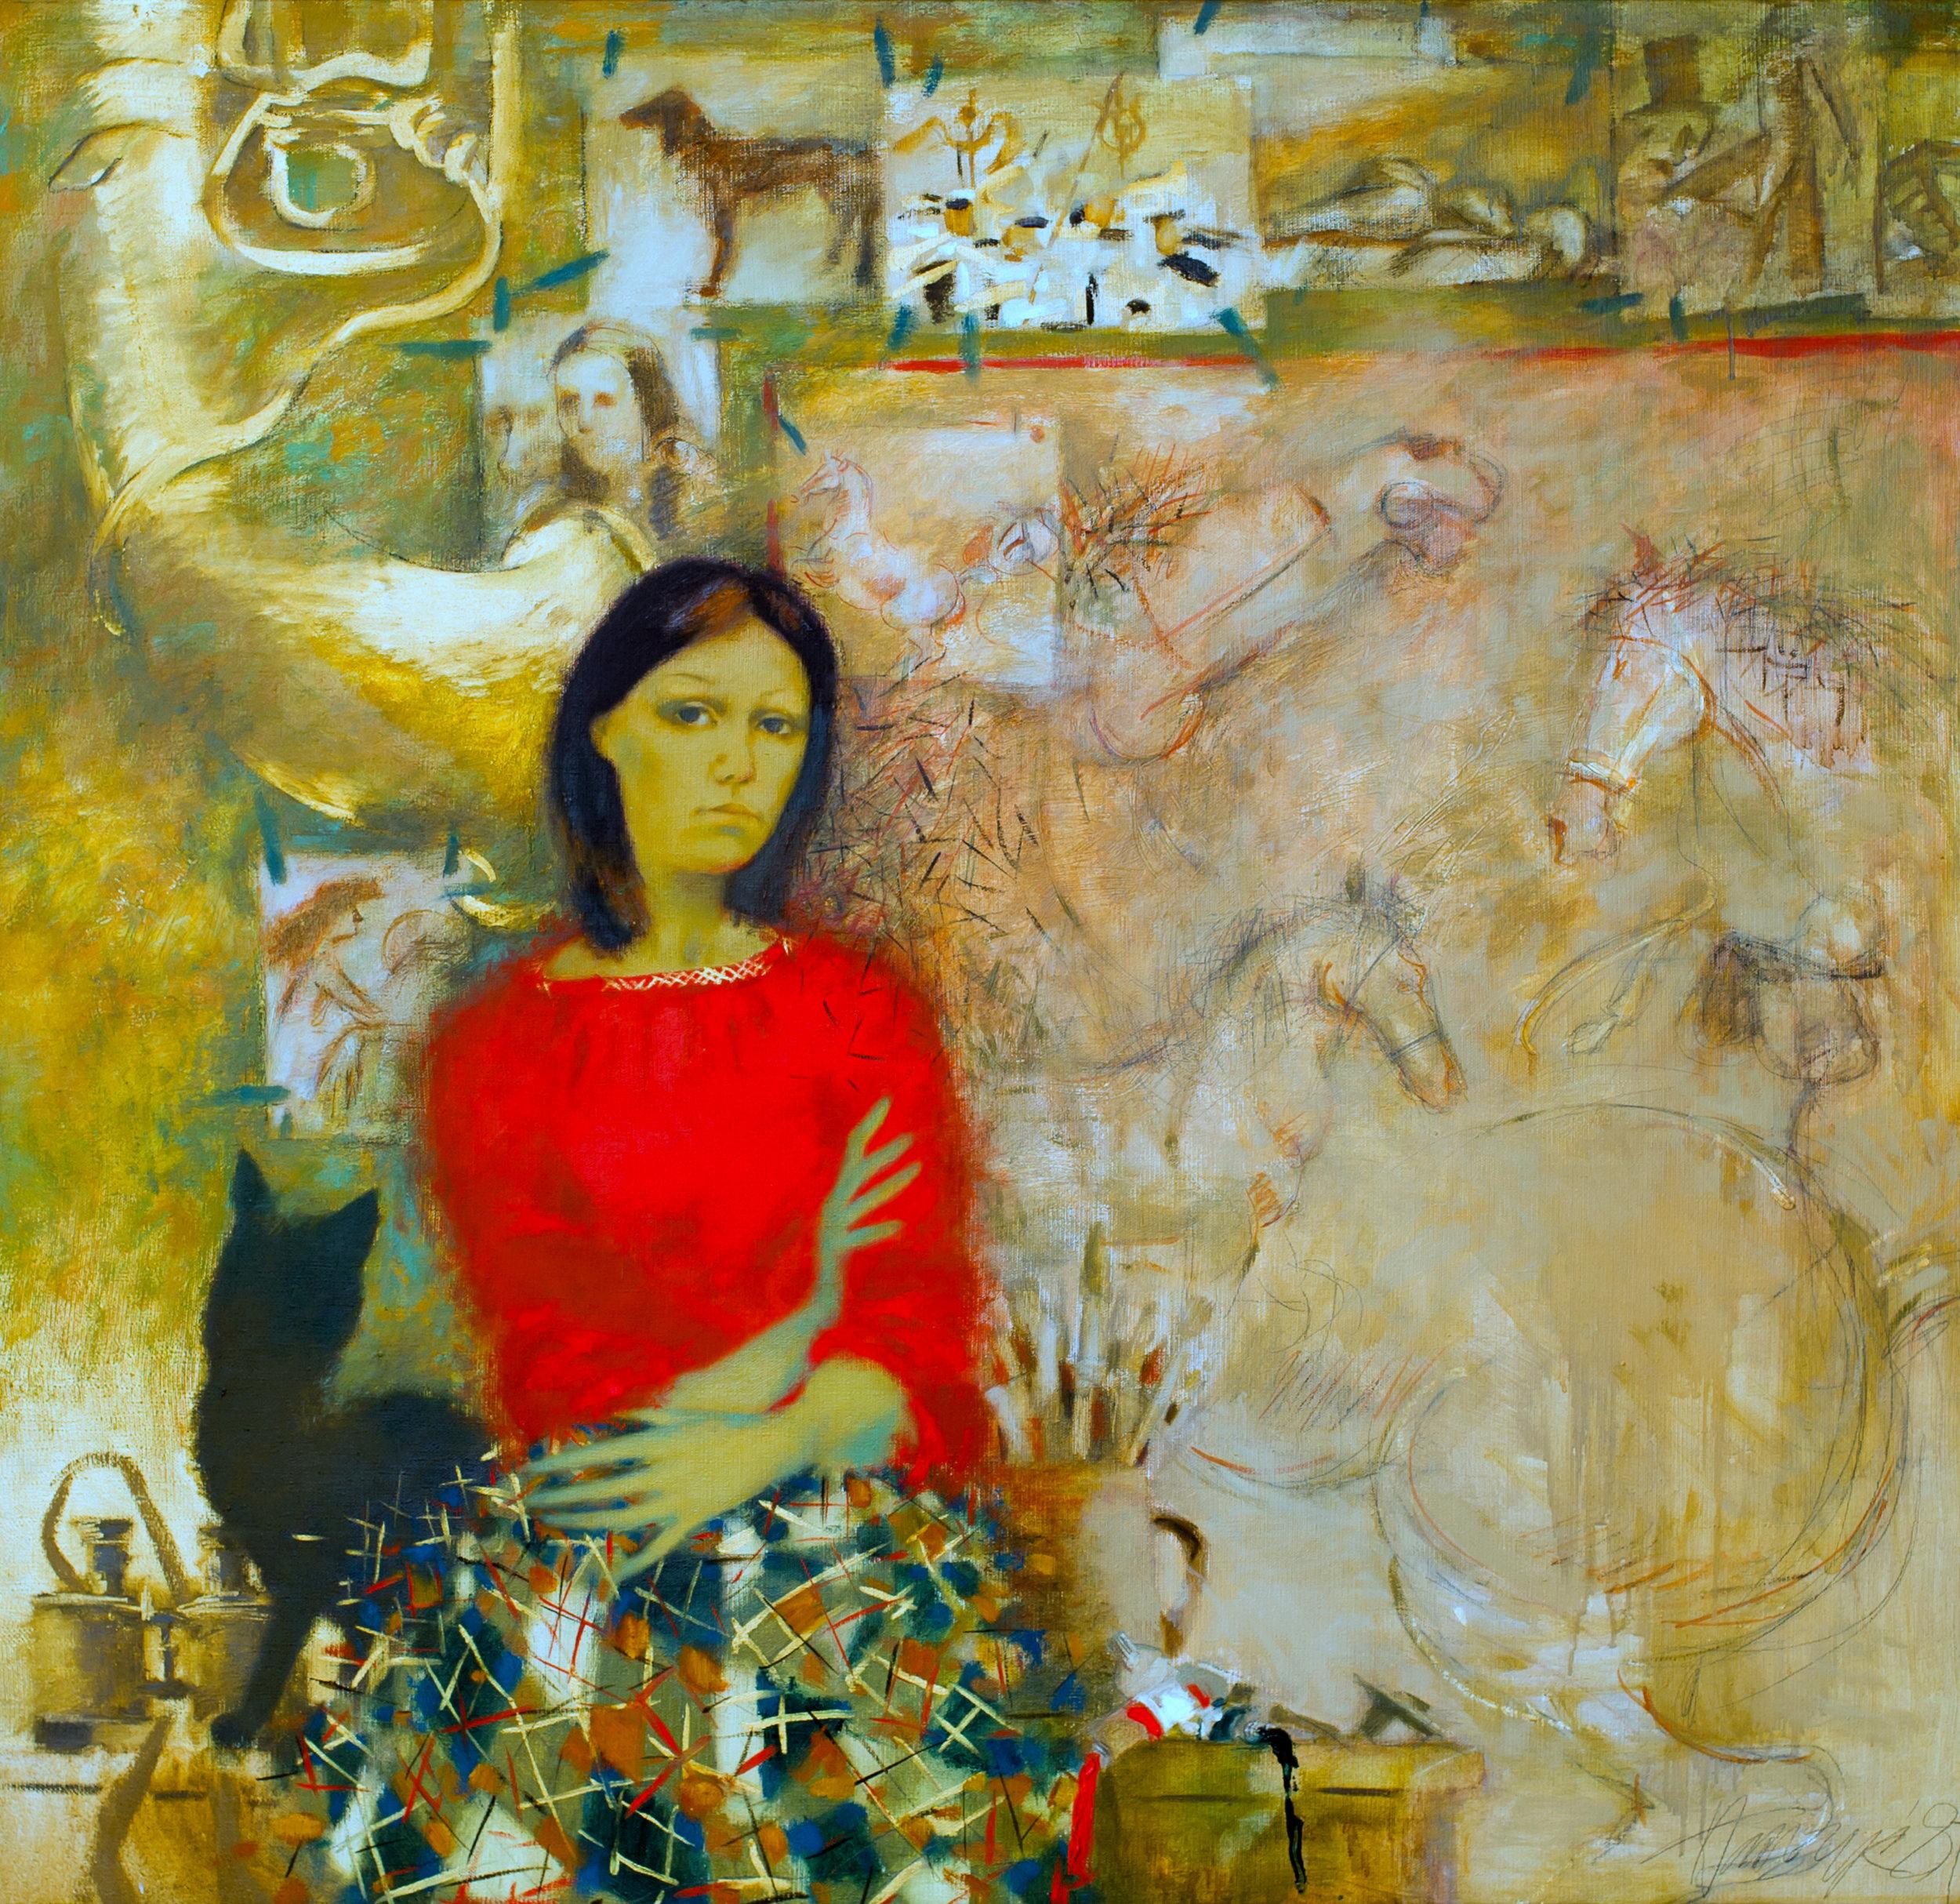 Tatjana_Palchuk_%E2%80%9CPasportrets%E2%80%9DTatyana+%28Self+portrait%29+110x114.1987..jpg